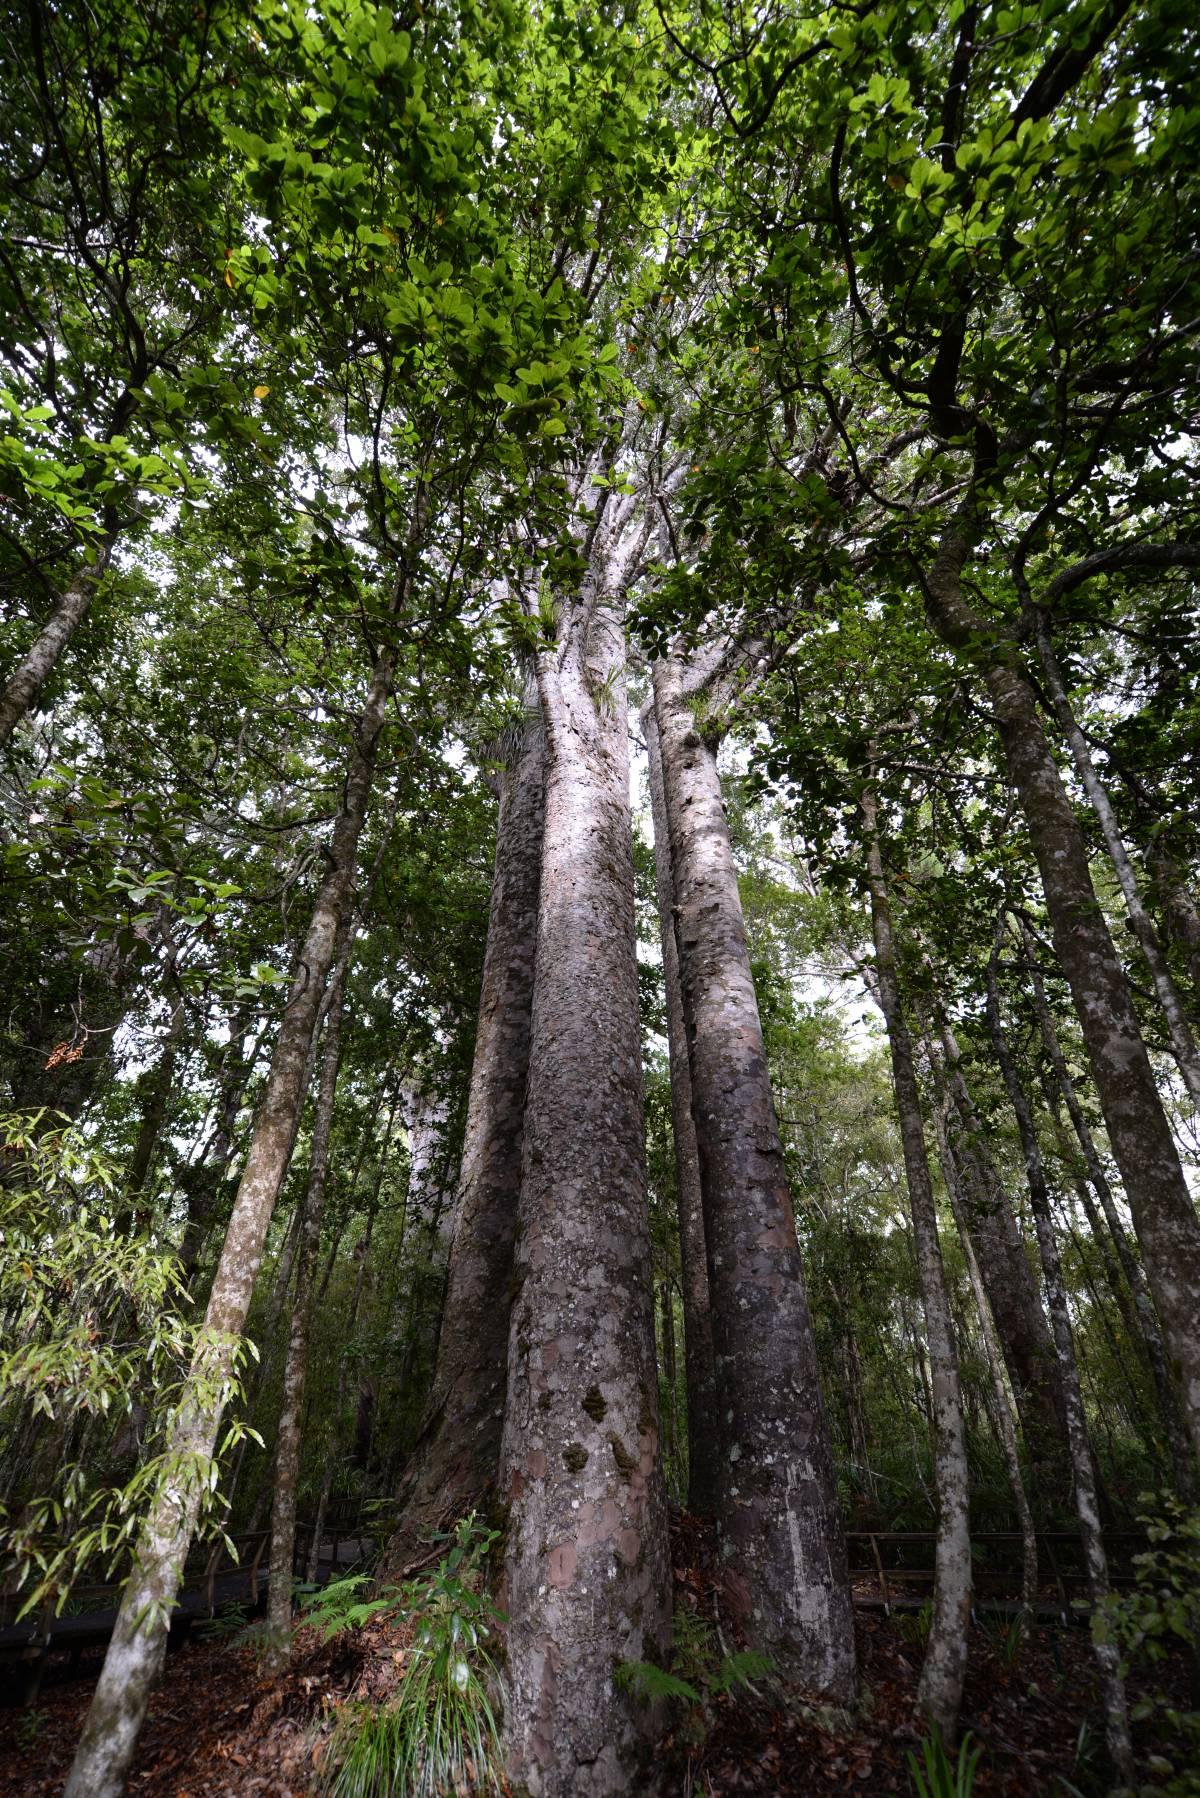 nz_cap_reinga_to_waipoua_forest_0111